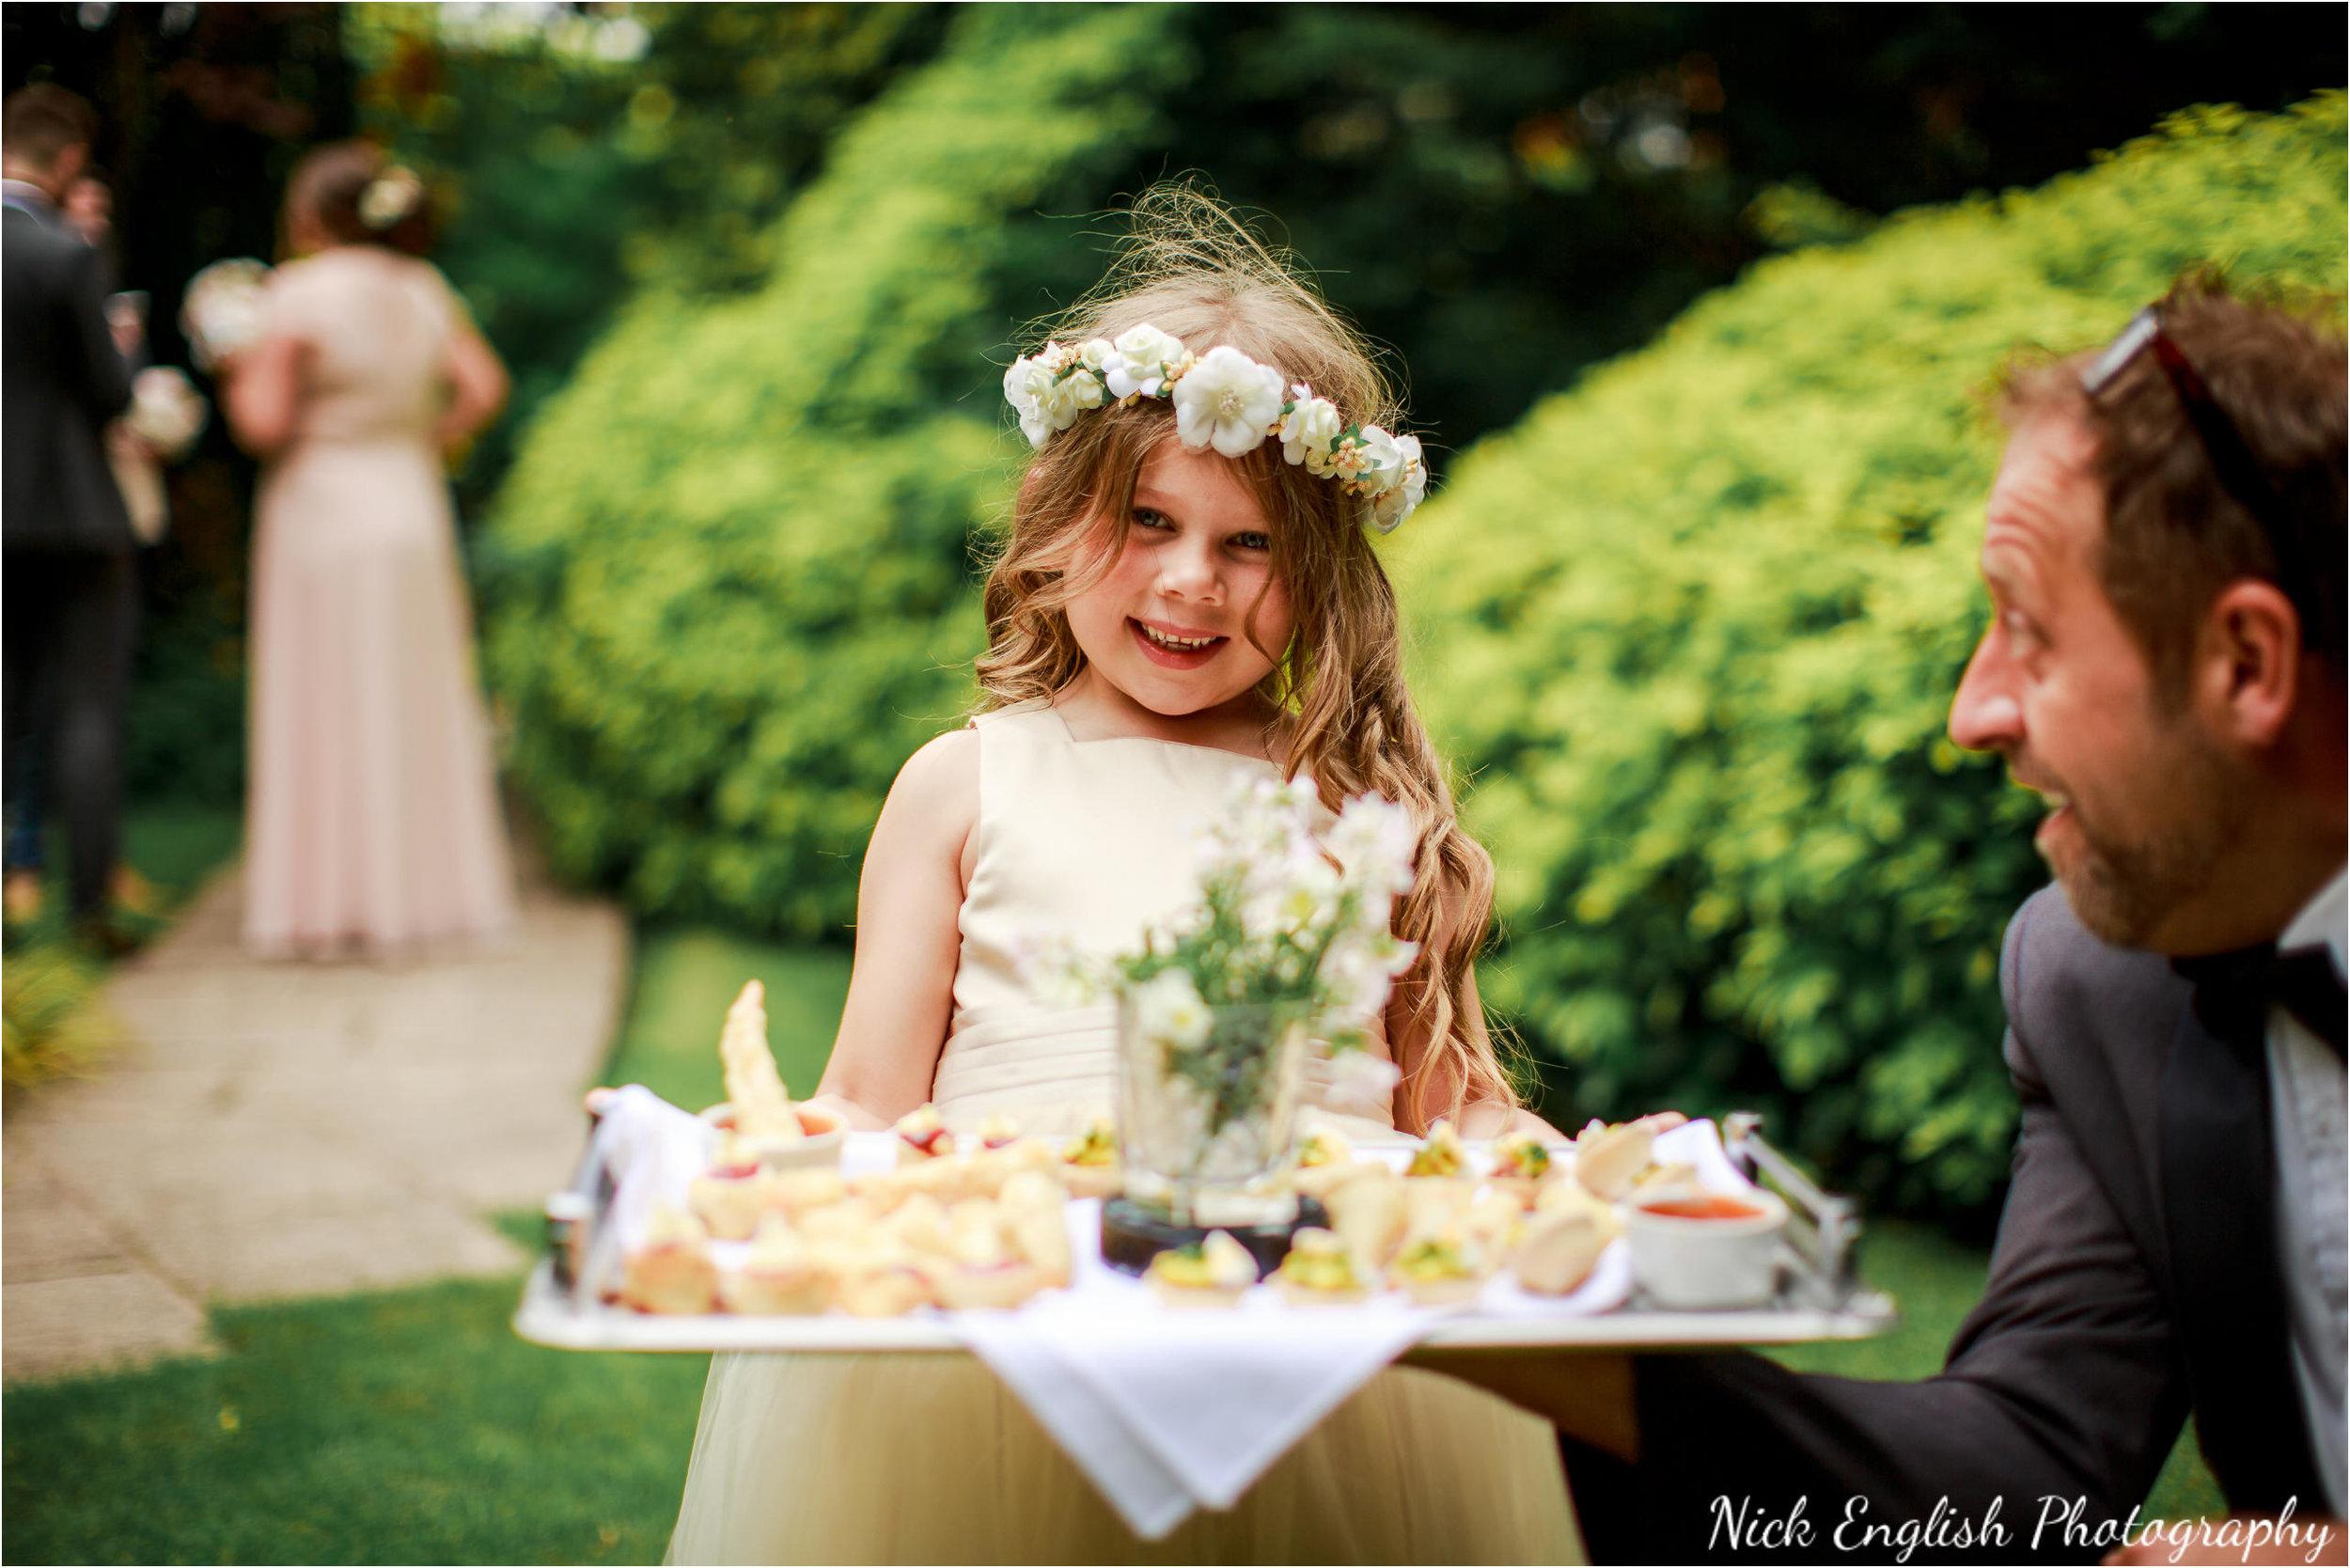 Emily David Wedding Photographs at Barton Grange Preston by Nick English Photography 131jpg.jpeg